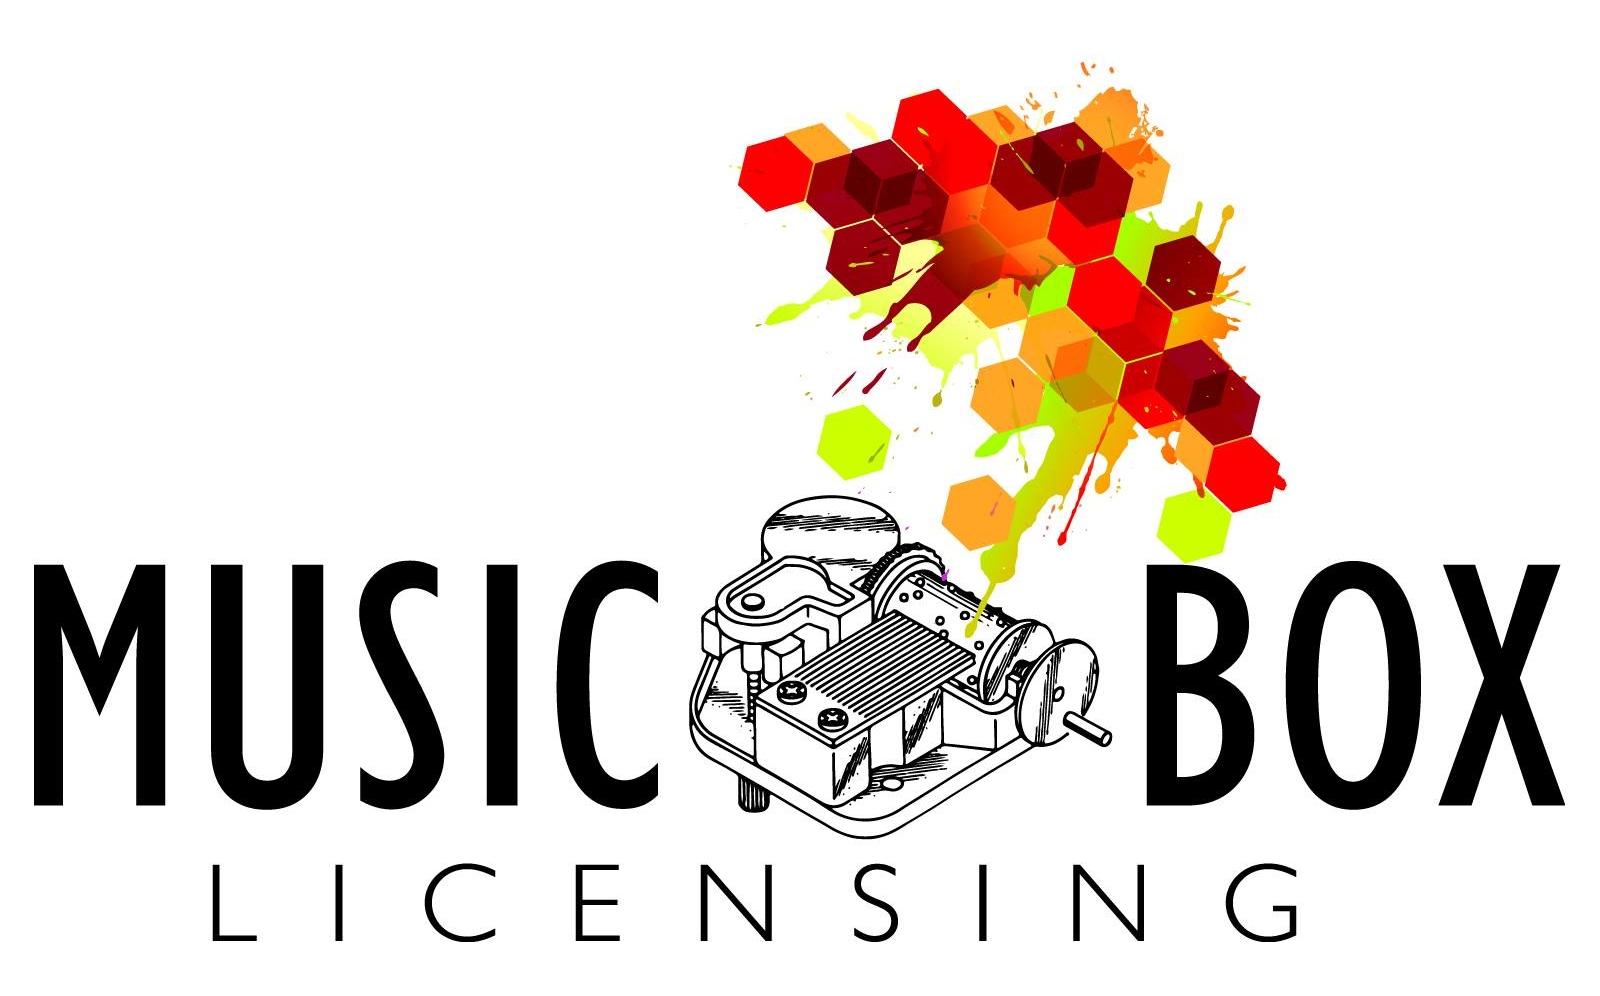 Music Box Licensing logo1 - Will Bangs.jpg